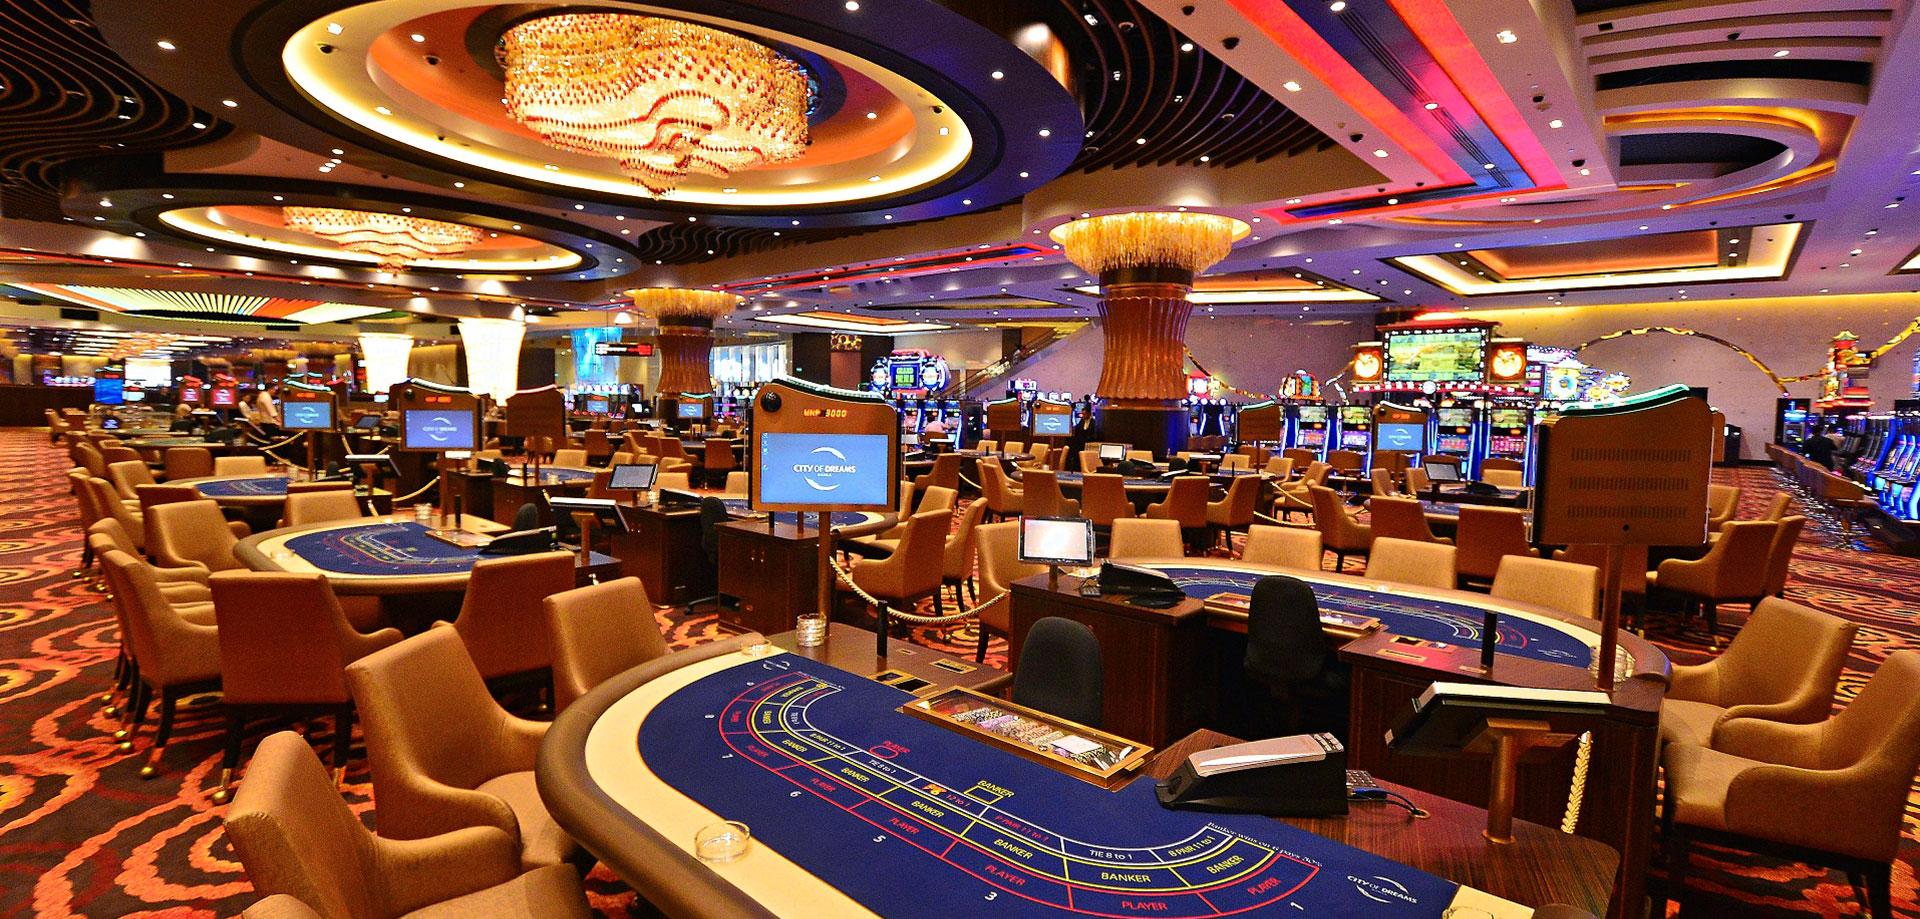 Industrie-de-casino-2